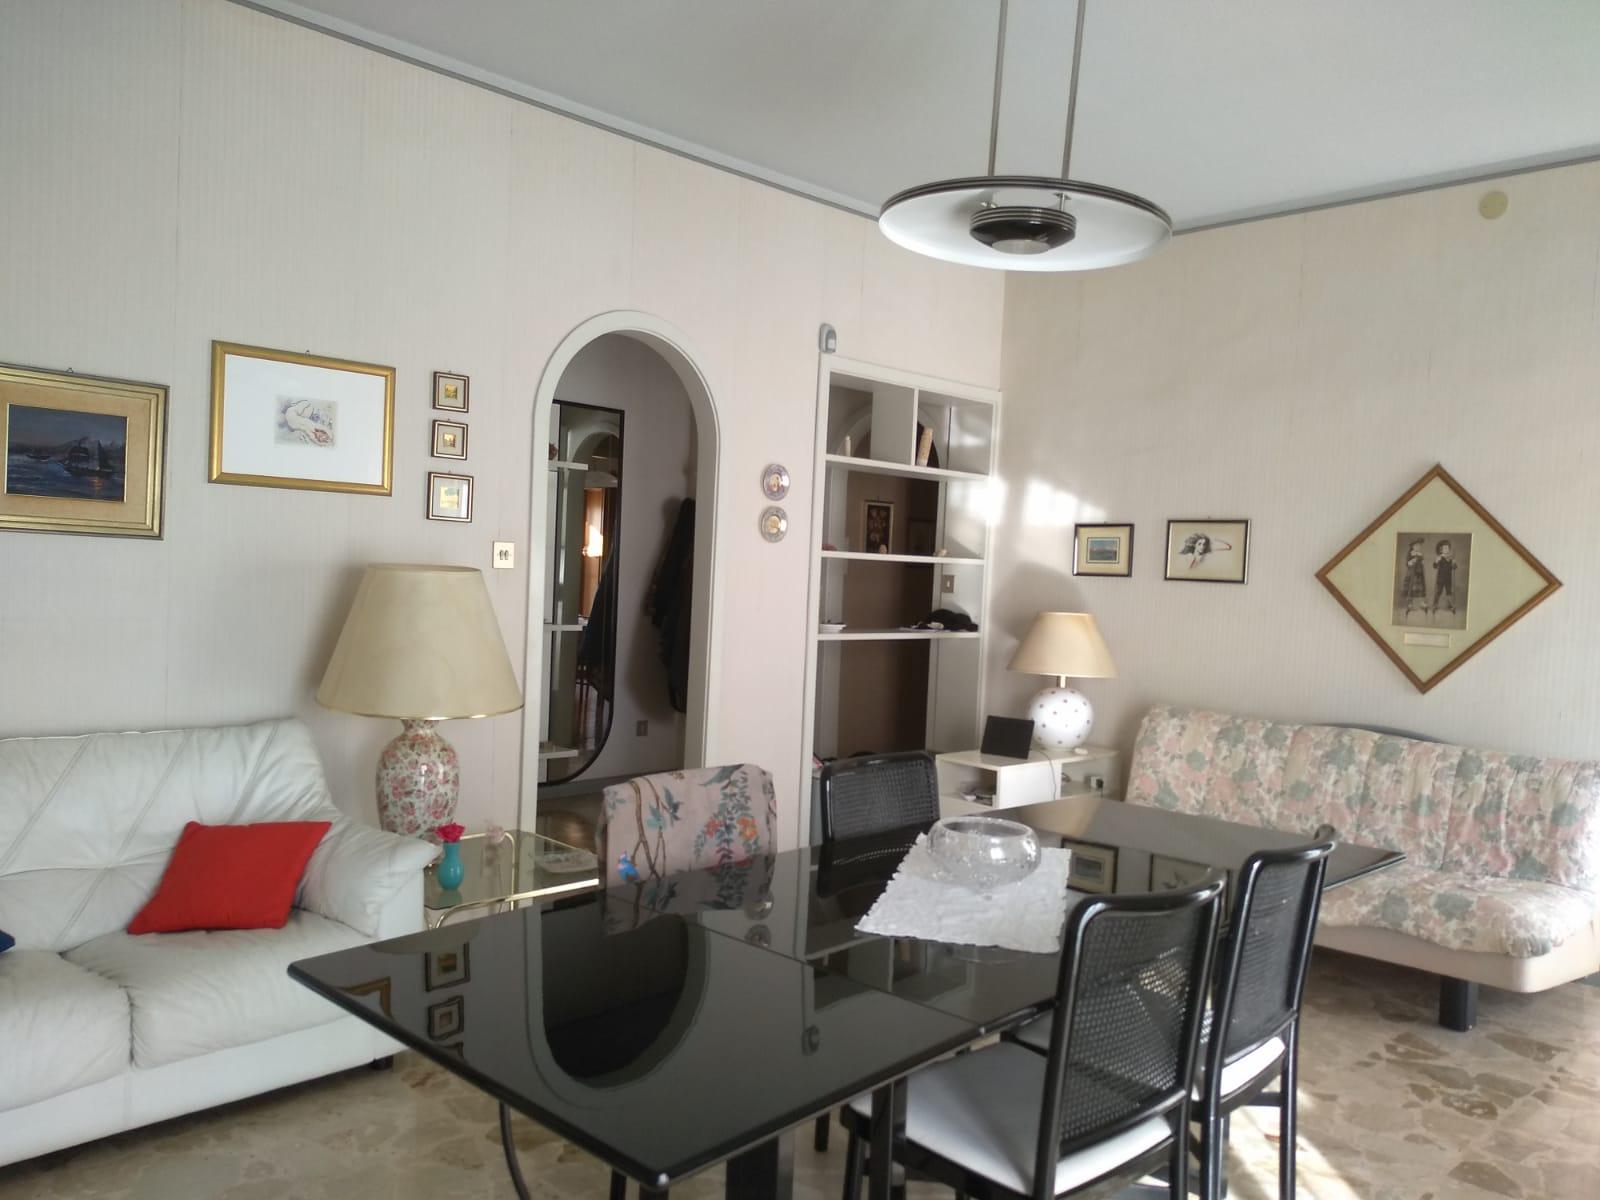 Appartamento 4 vani  San Giovanni La Punta Trappeto  Via Carmelitani